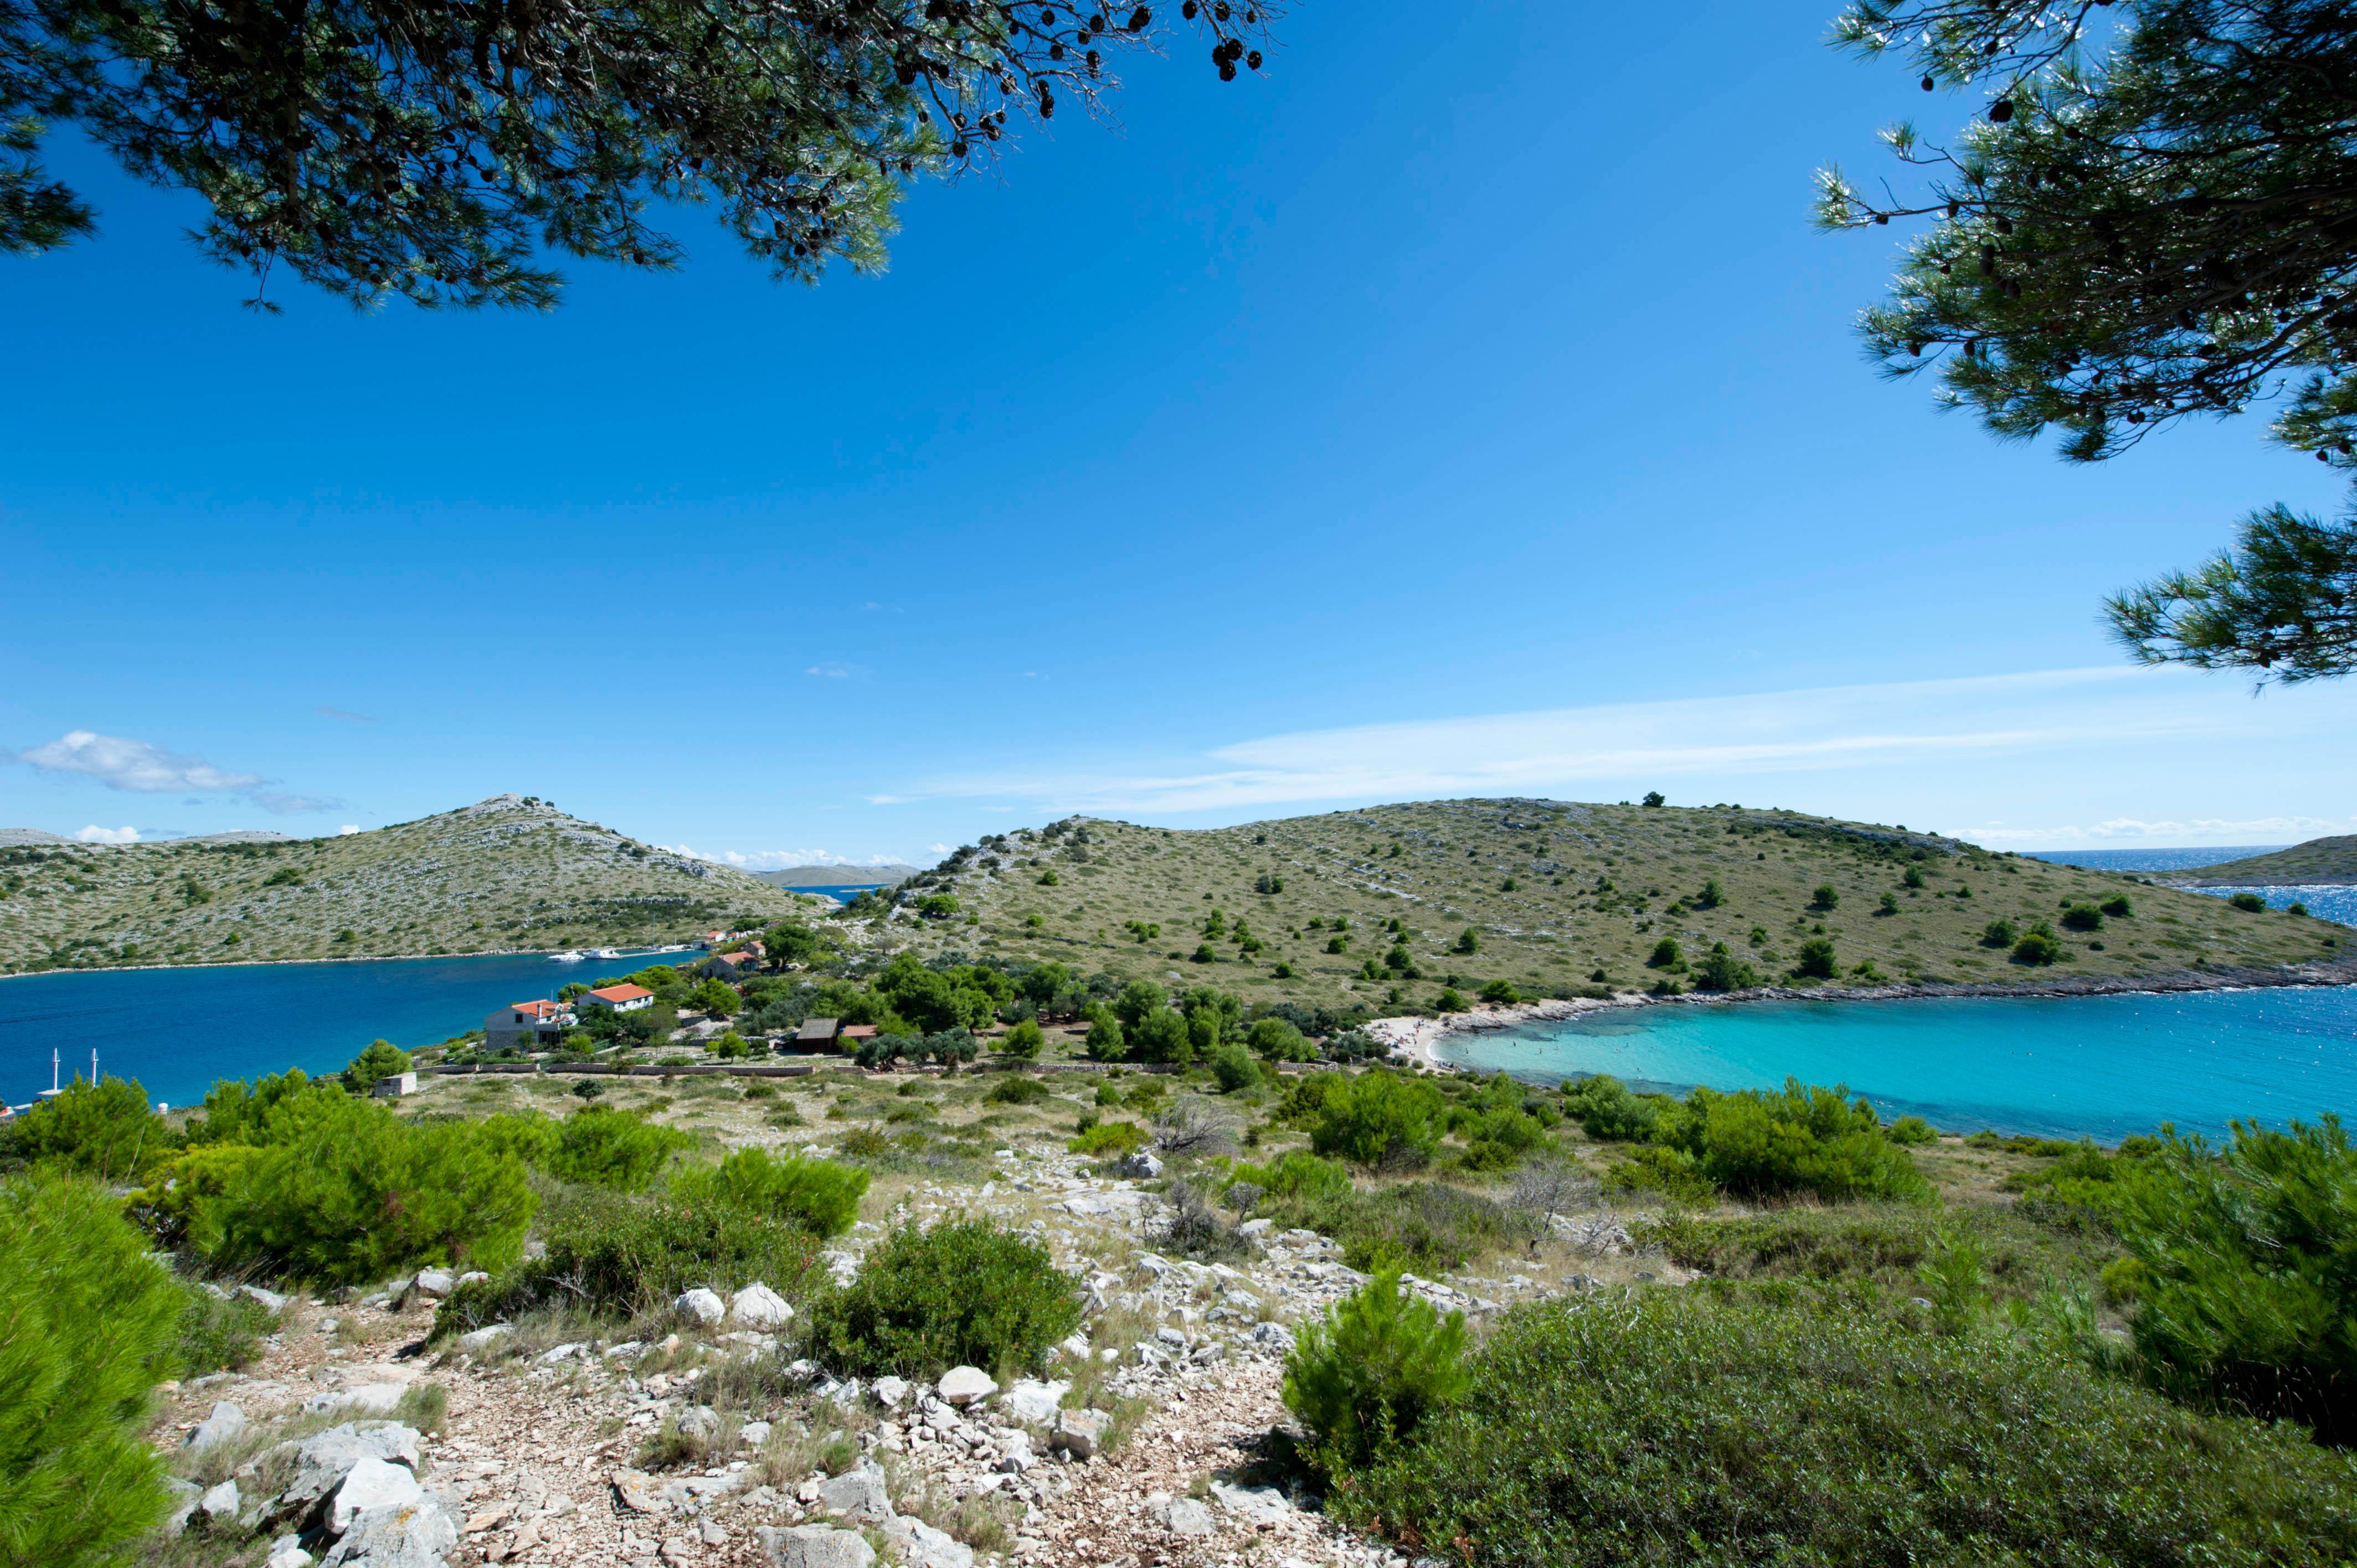 9702-Parc national iles Kornati (Dalmatie du Nord)